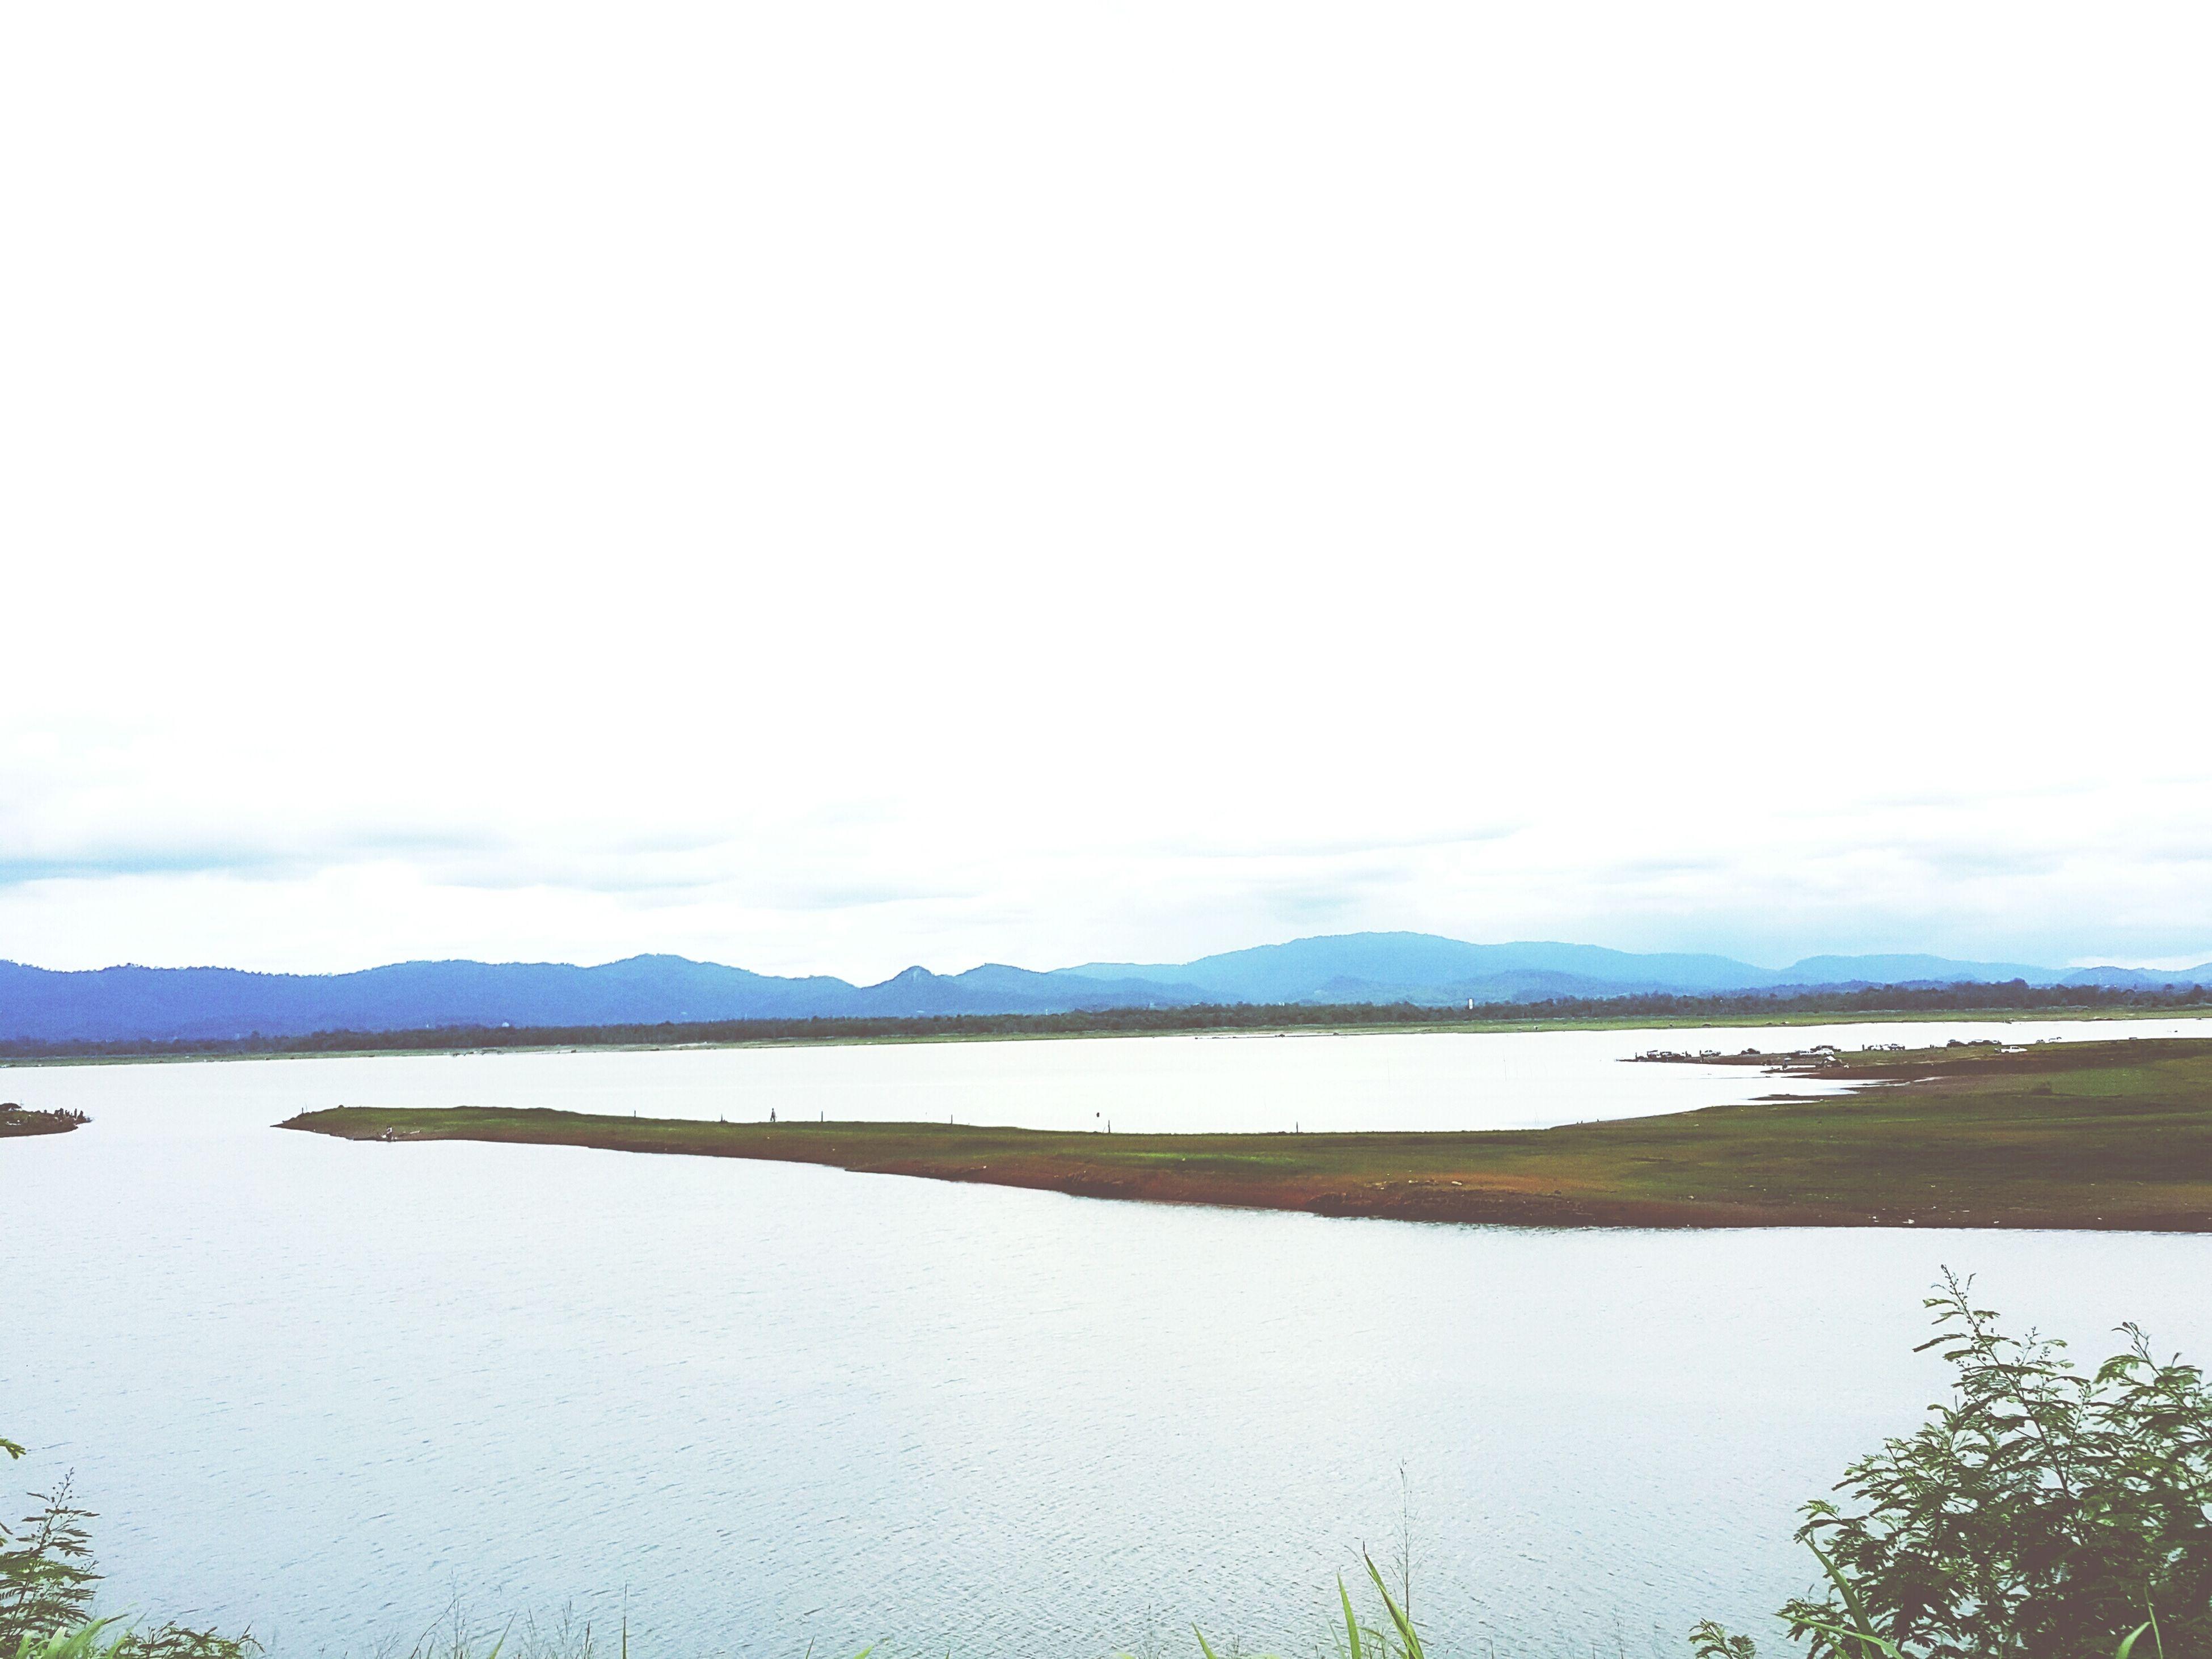 water, tranquil scene, tranquility, scenics, mountain, beauty in nature, sea, sky, nature, lake, beach, copy space, shore, mountain range, idyllic, calm, sand, outdoors, non-urban scene, day